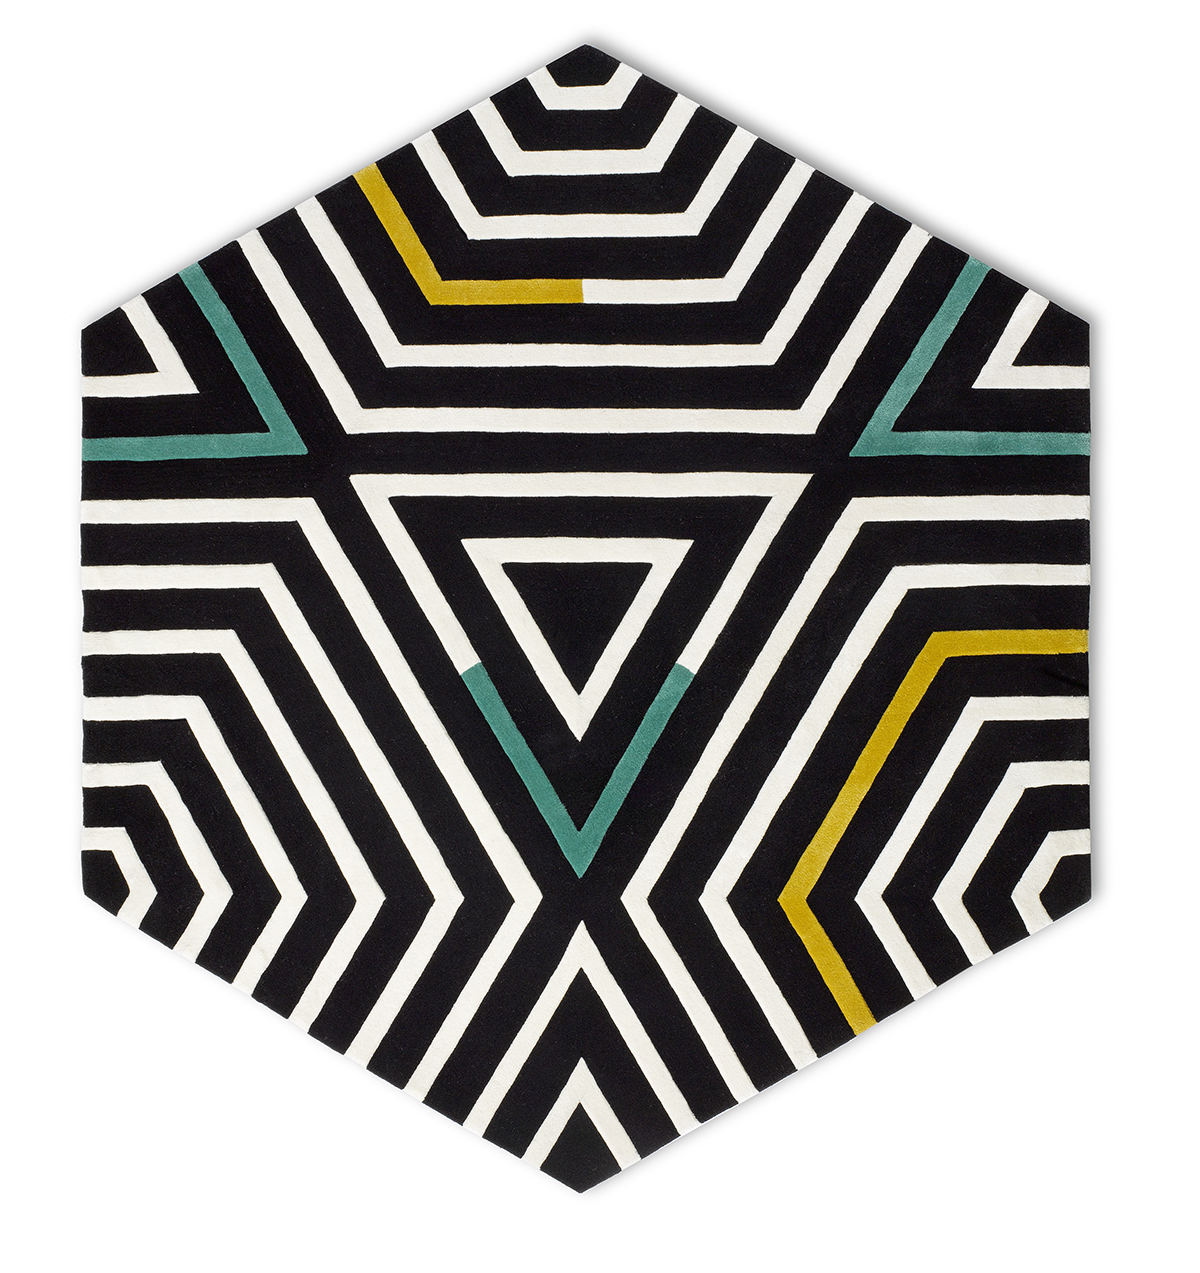 Groundb w zebra lrg hex